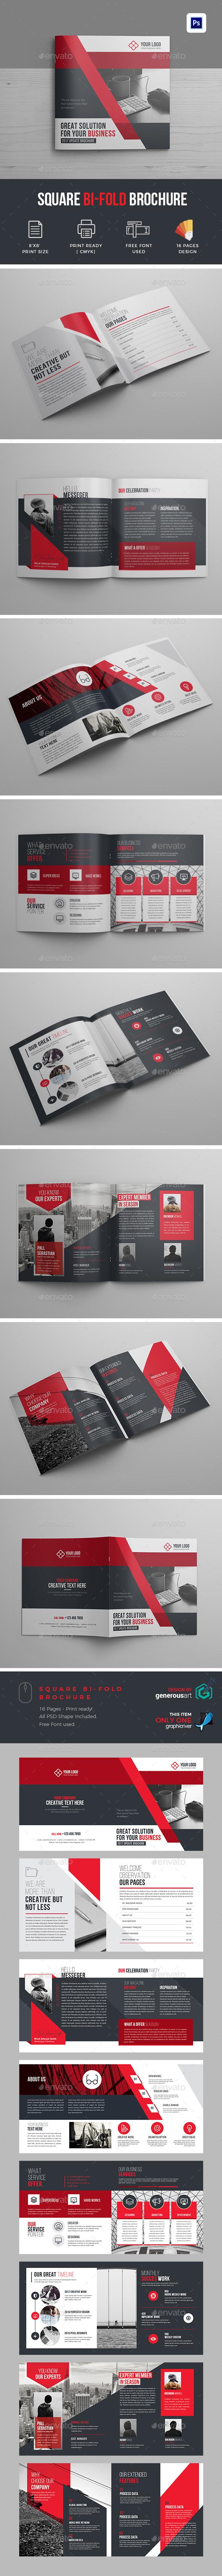 Creative Square Bi-Fold Brochure Template - Brochures Print Templates